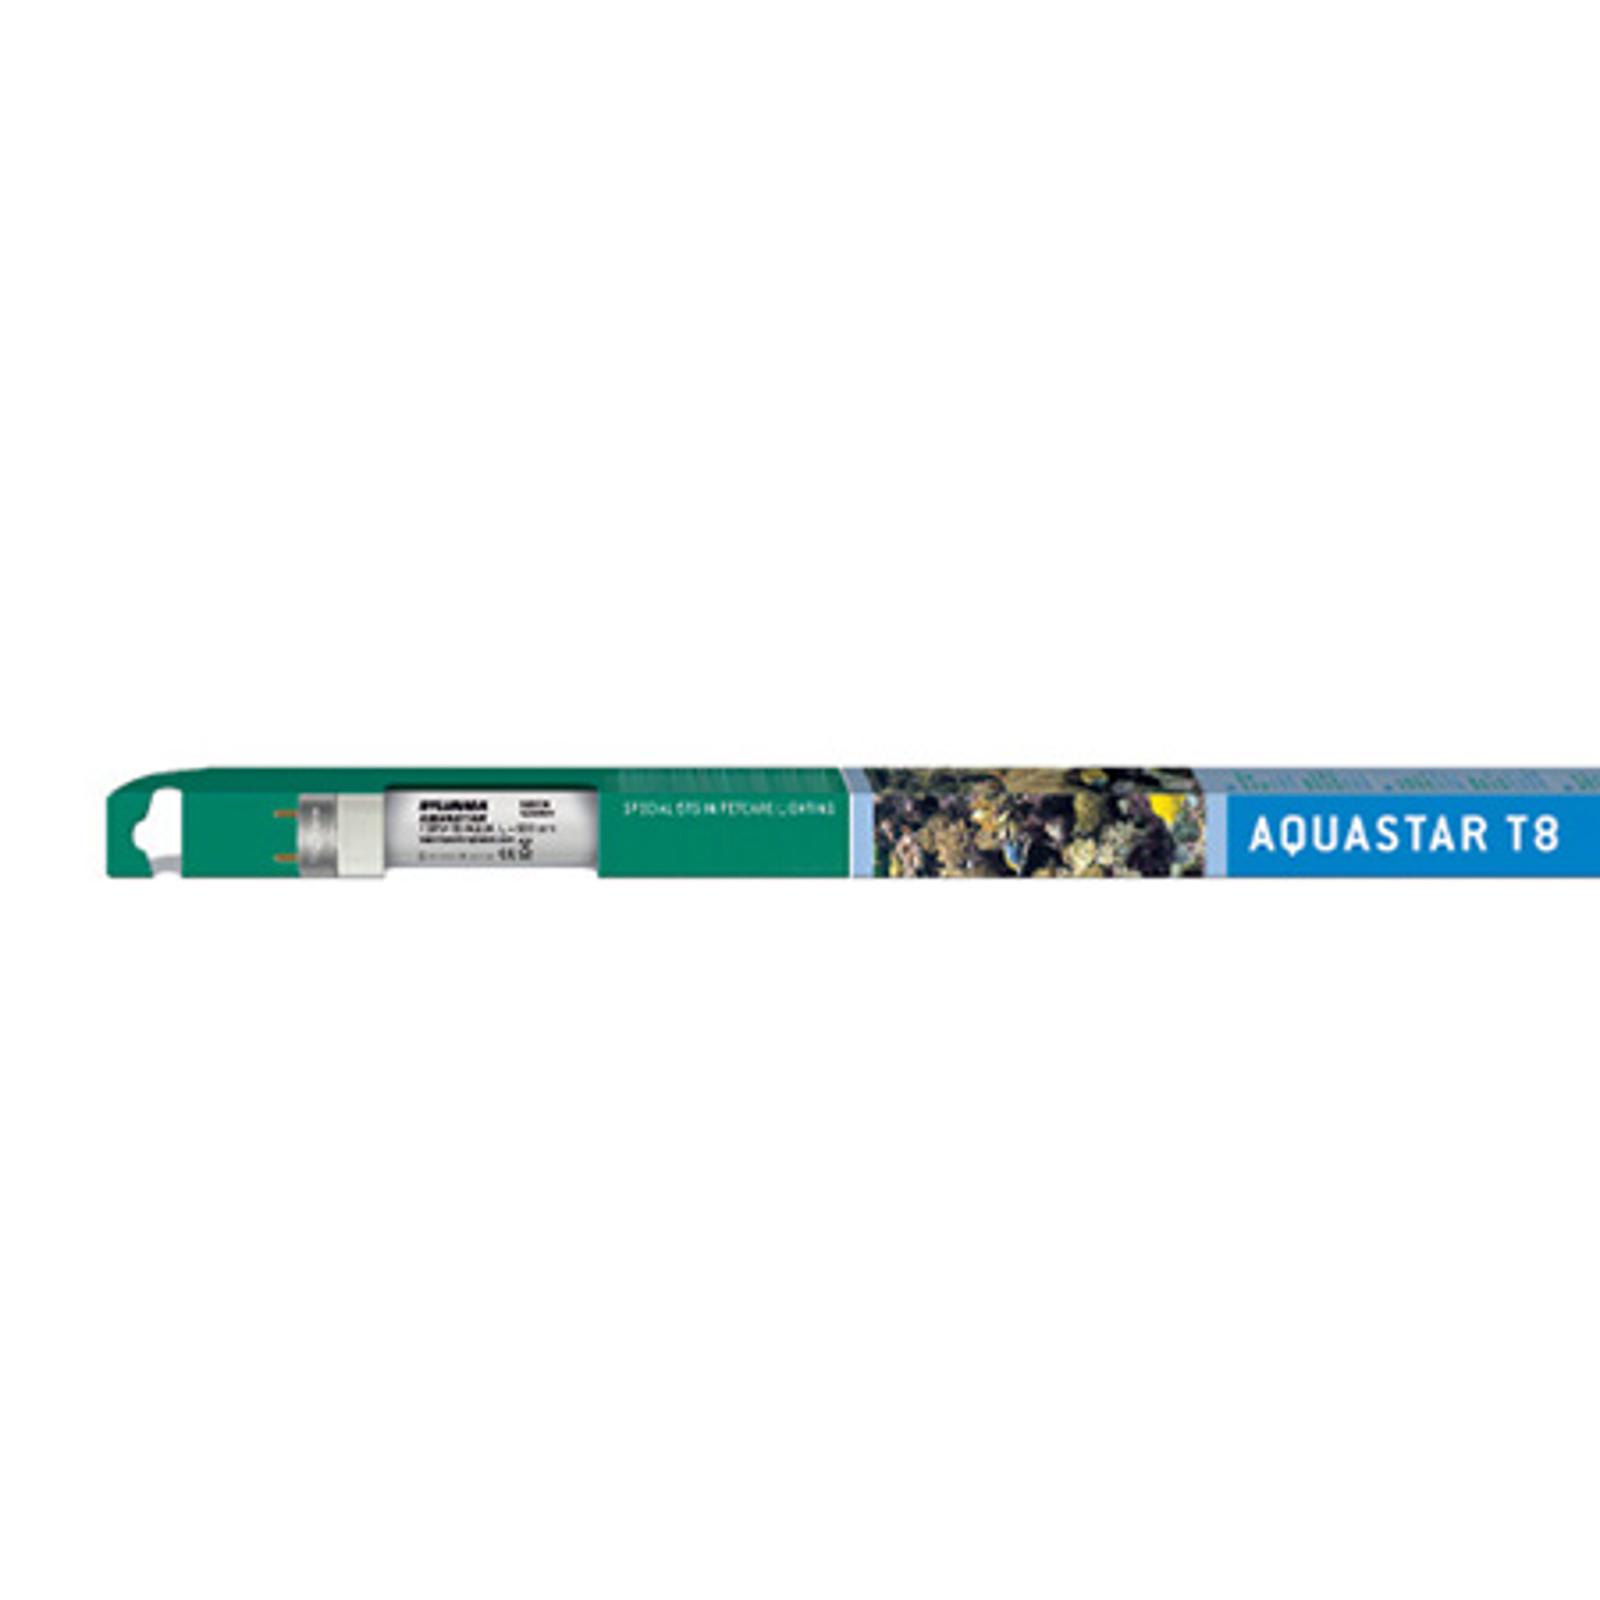 G13 T8 25W Aquastar dagslys specialpære